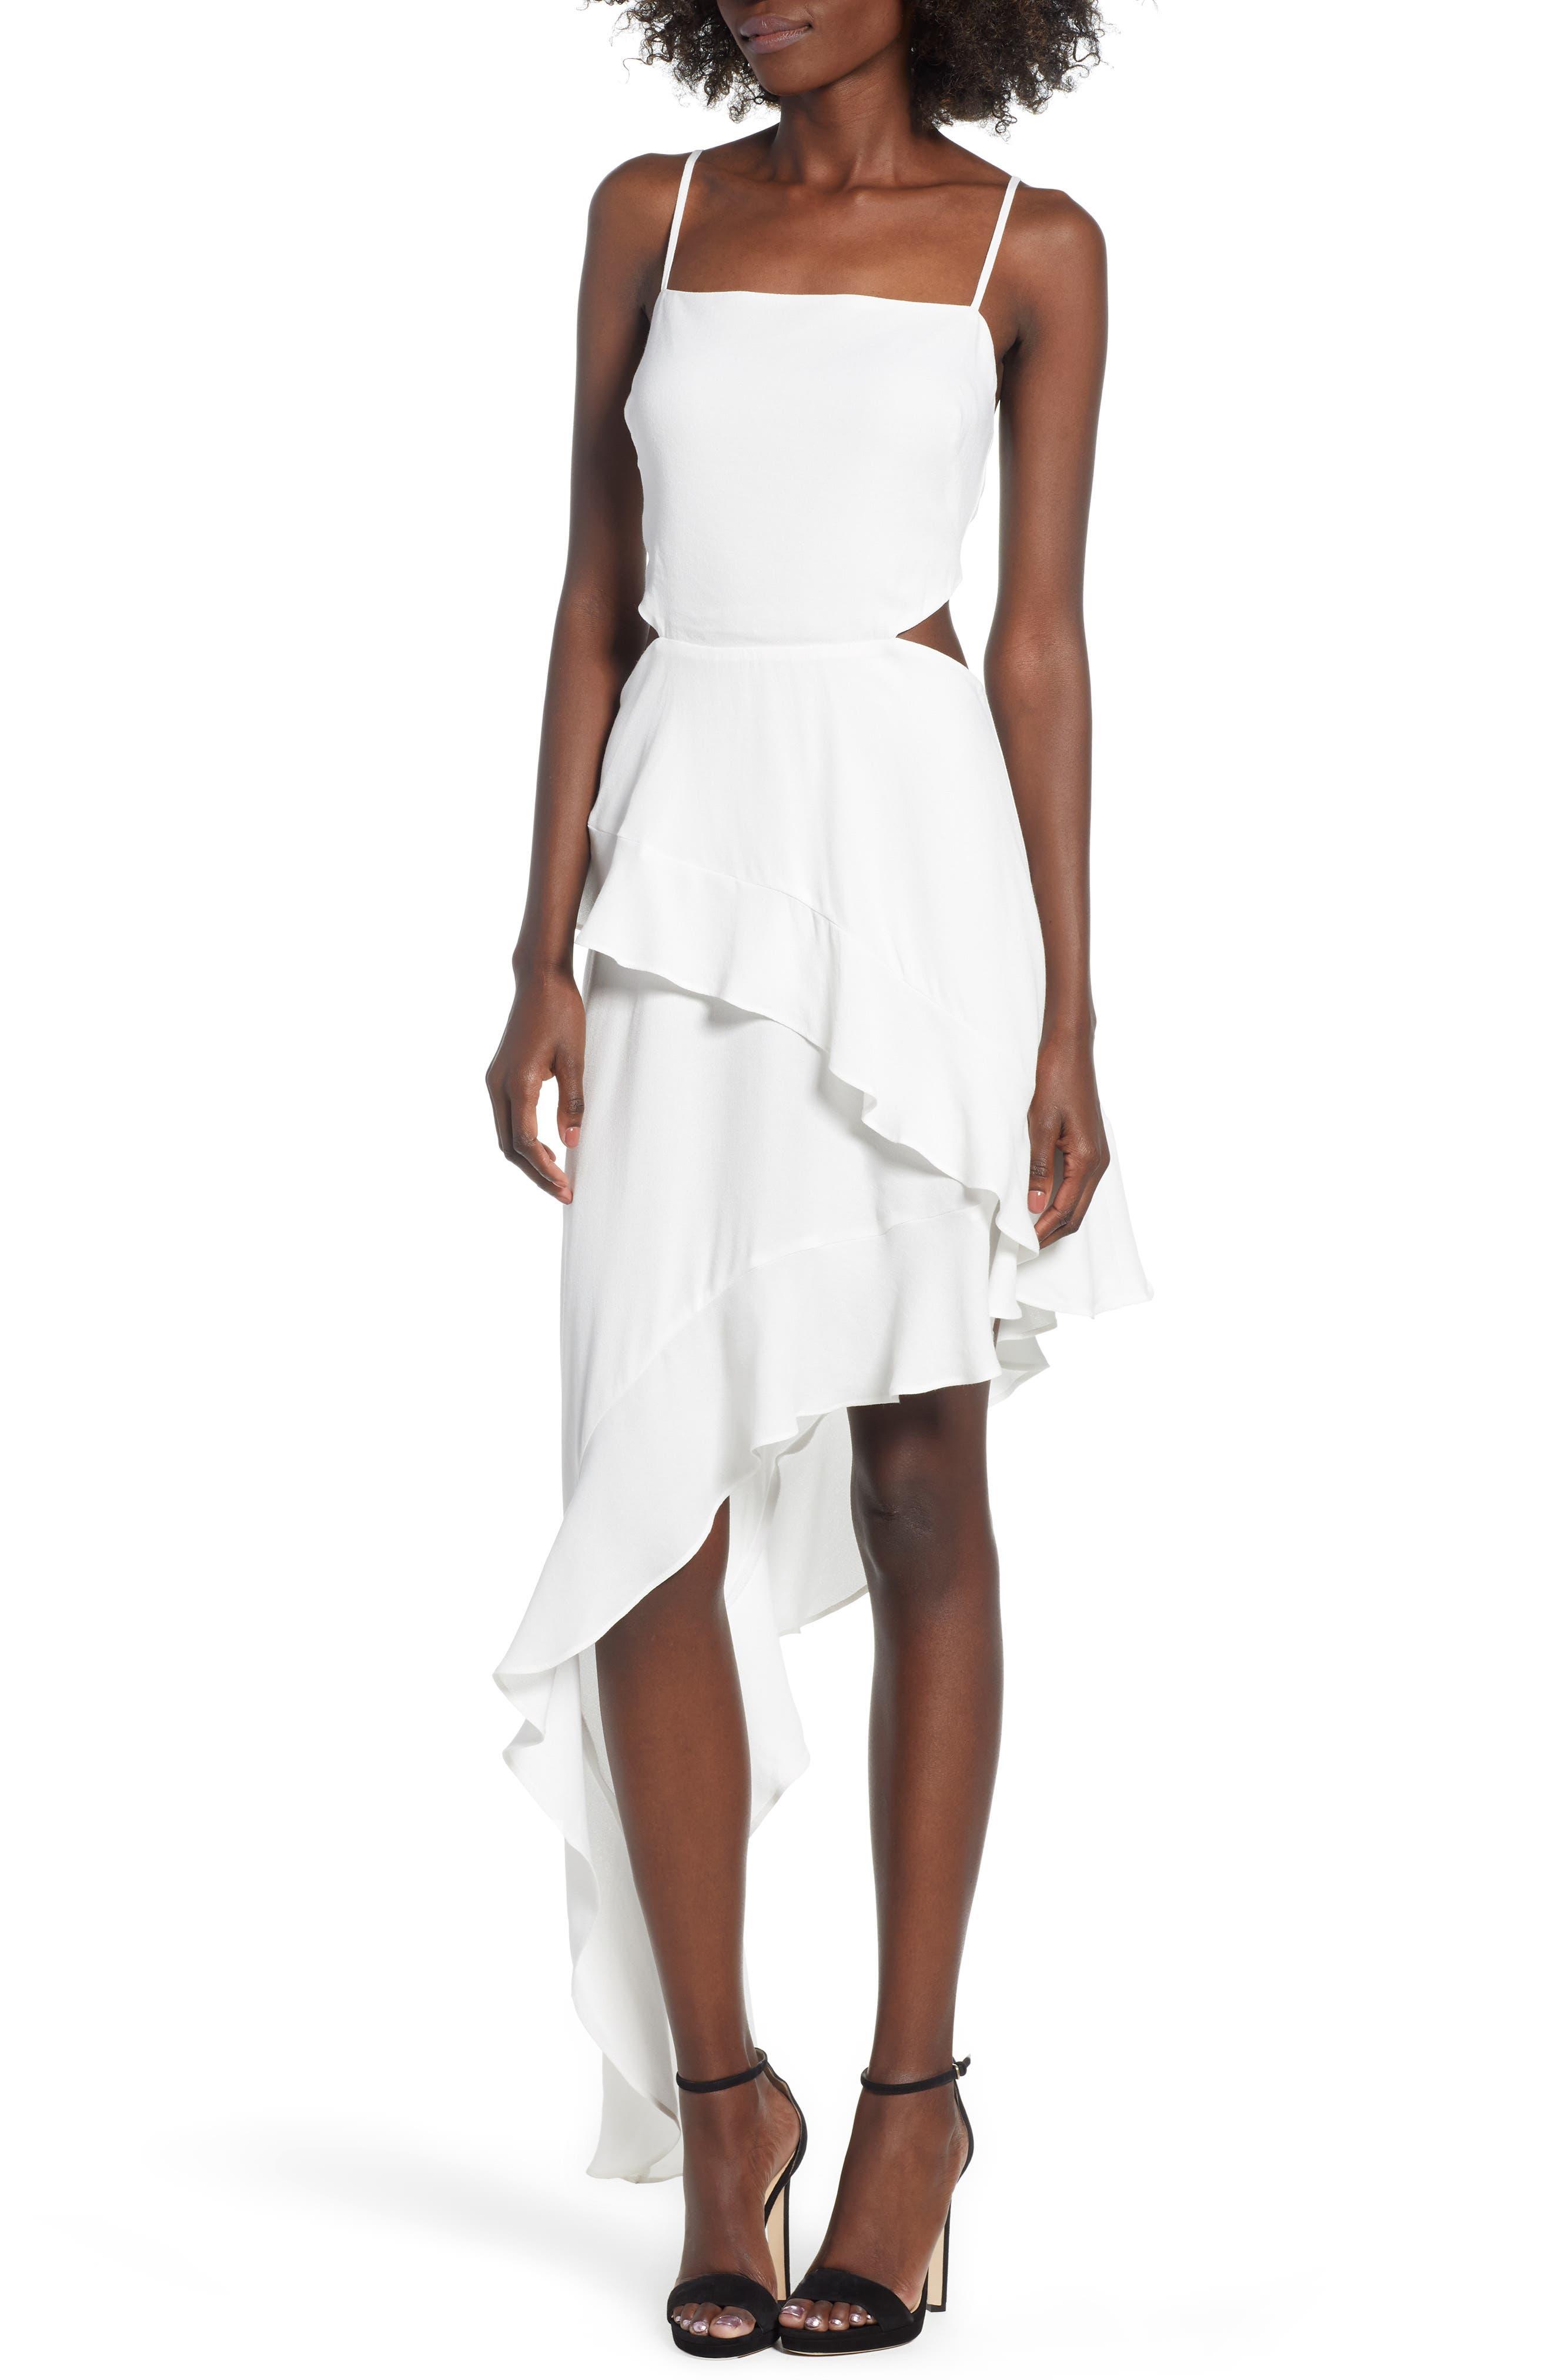 Cayli Asymmetrical Dress,                             Main thumbnail 1, color,                             100